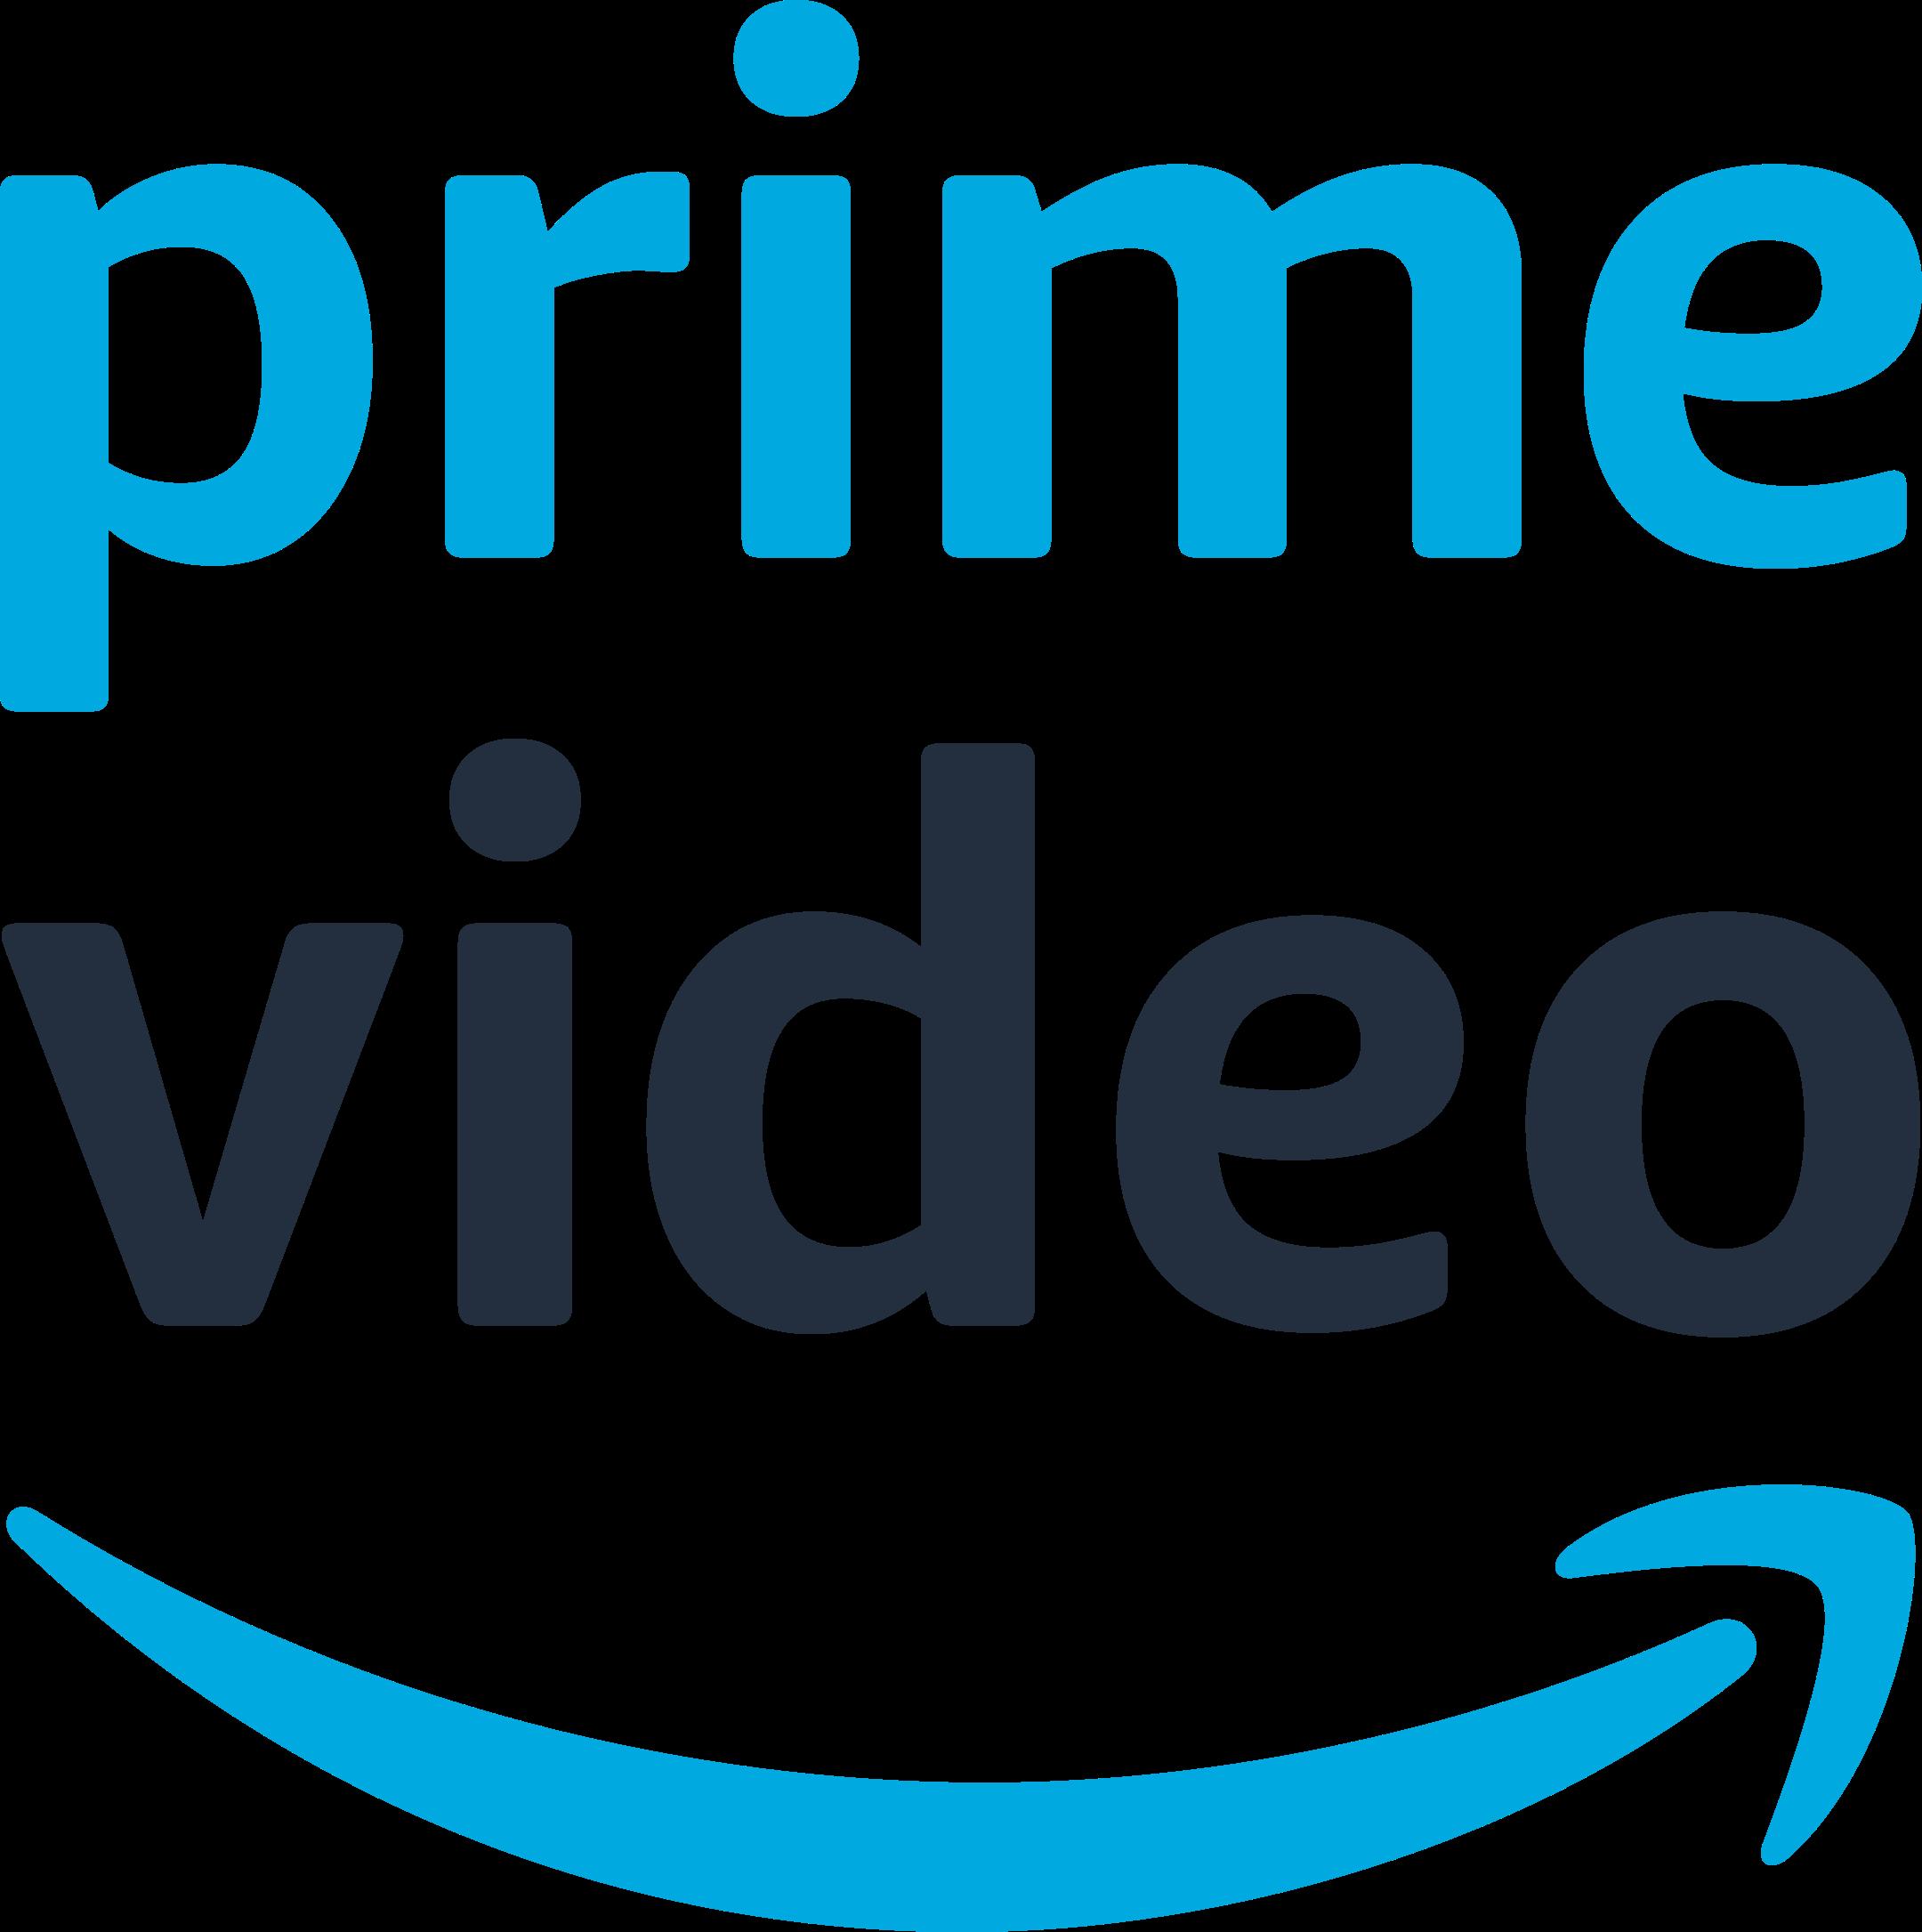 Amazon Prime Video Logo PNG - FREE Vector Design - Cdr, Ai ...Amazon Png